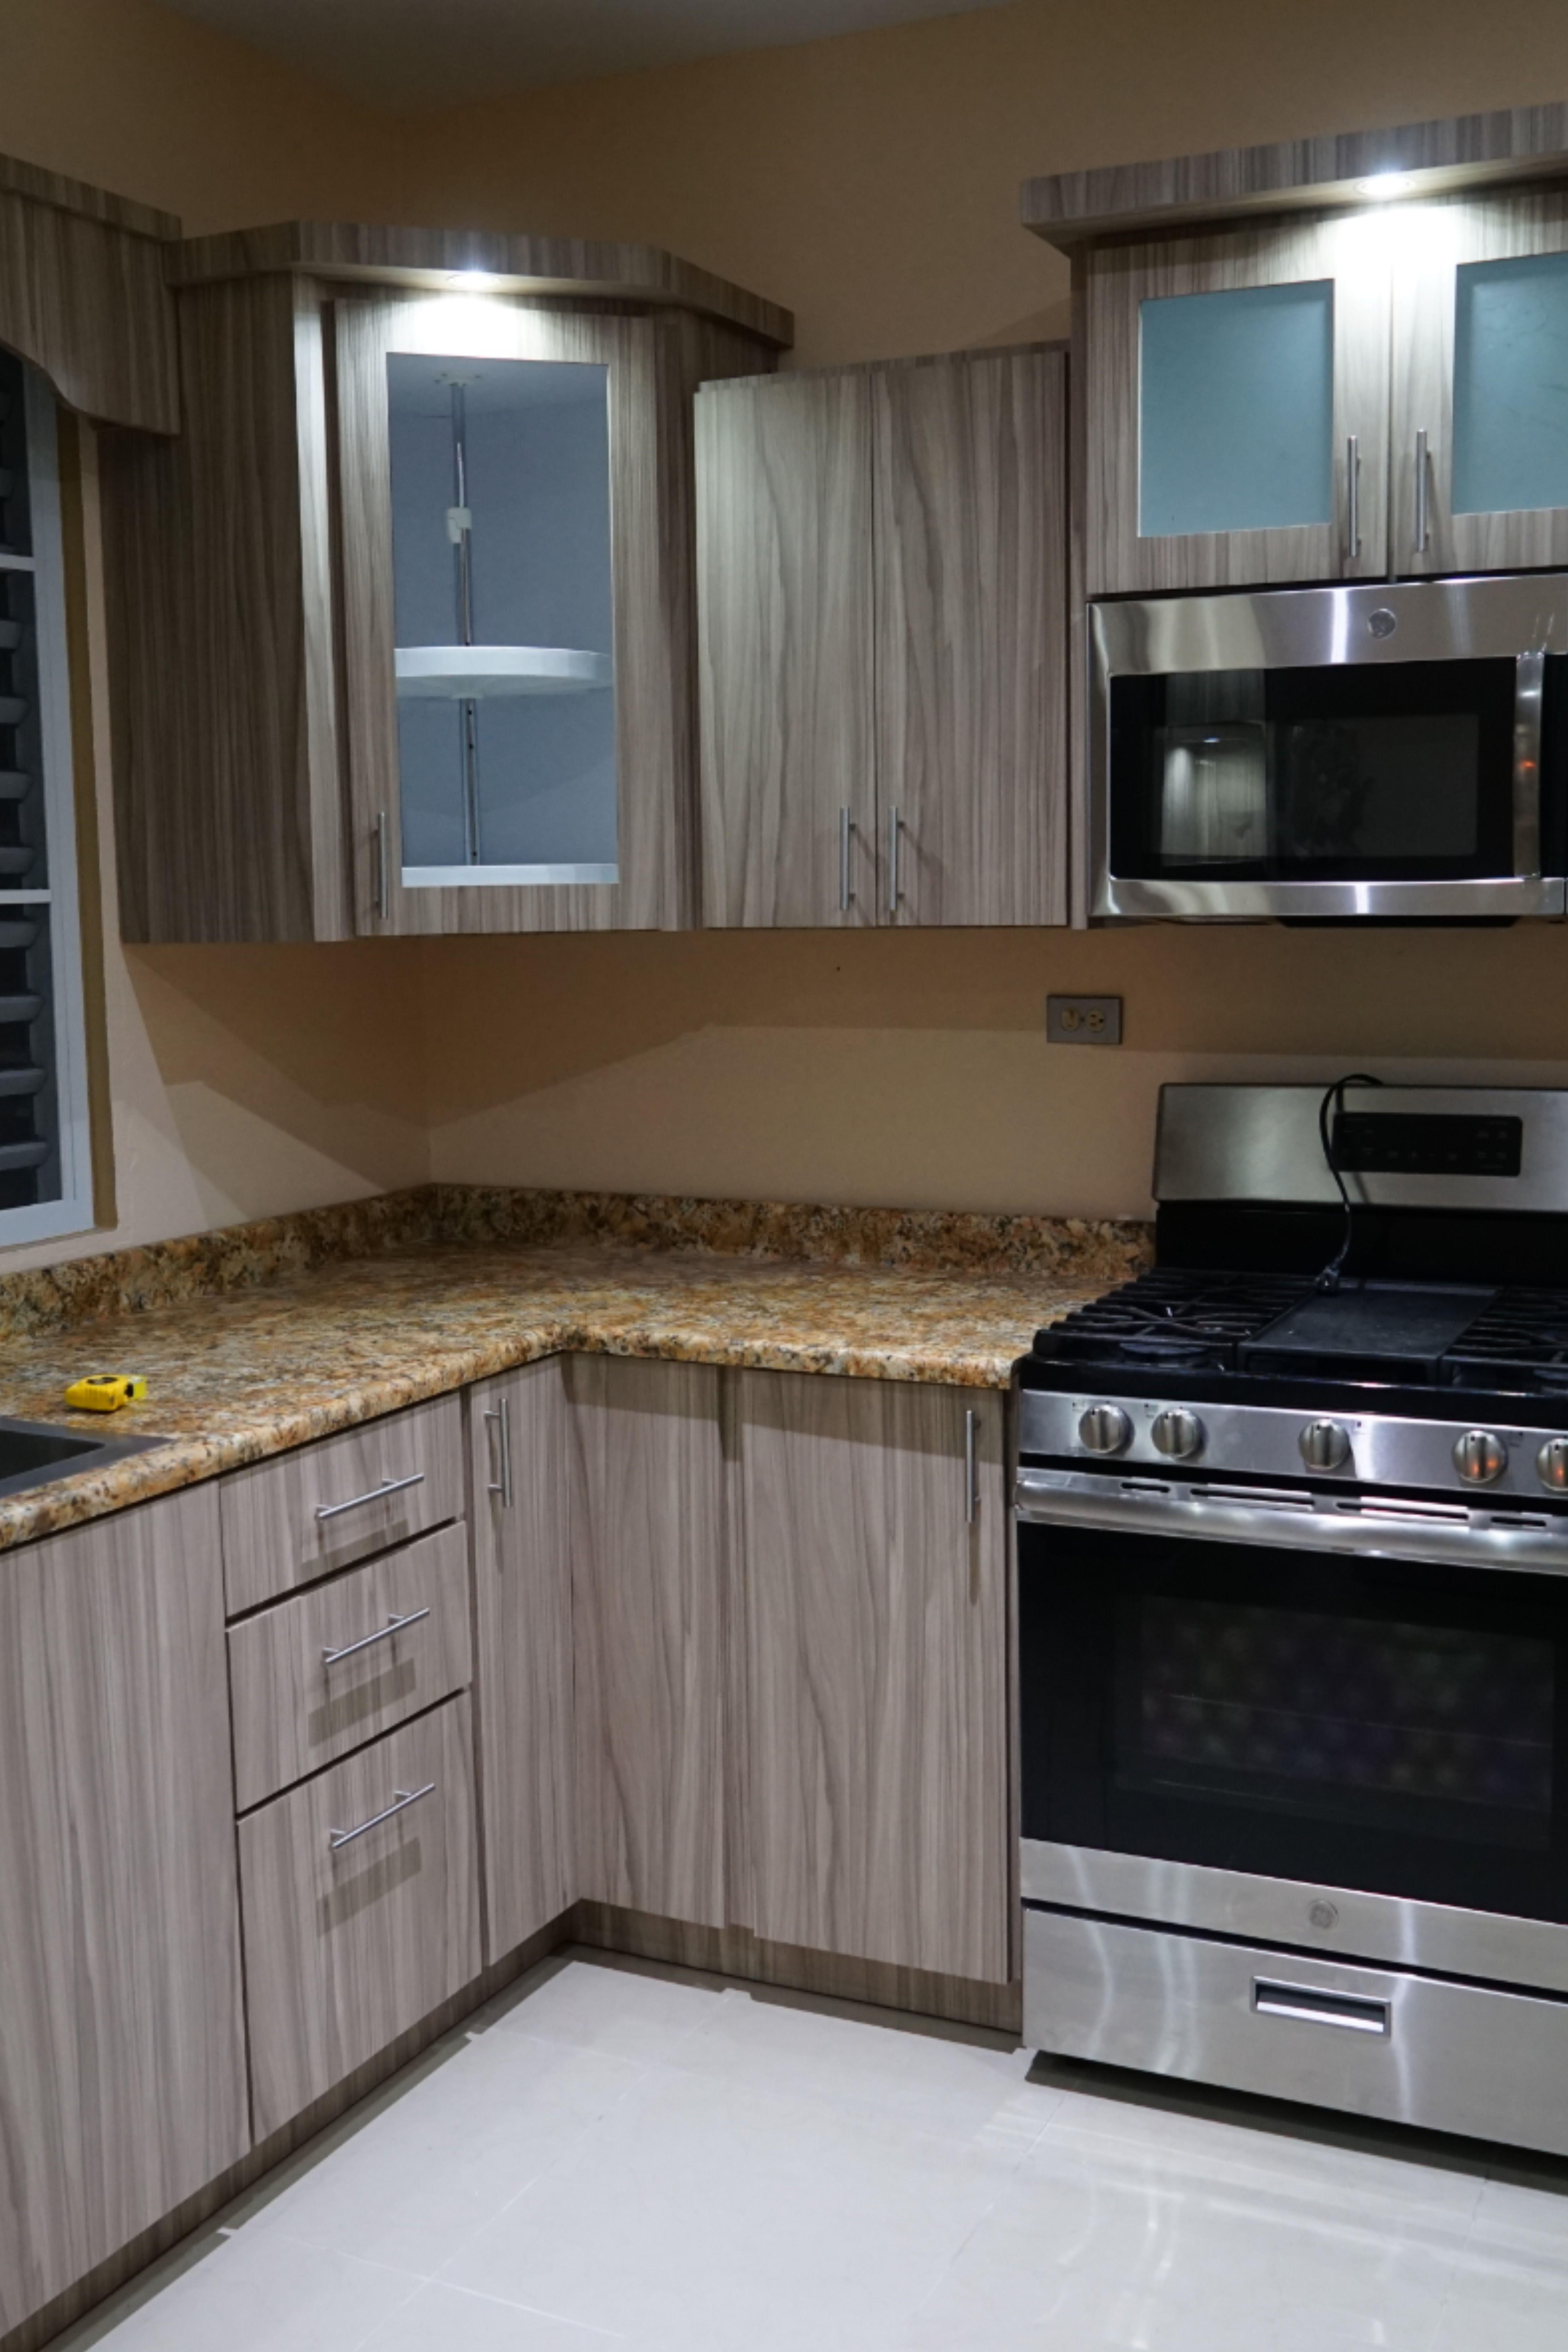 Gabinetes De Cocina En Pvc In 2020 Kitchen New Kitchen Kitchen Cabinets